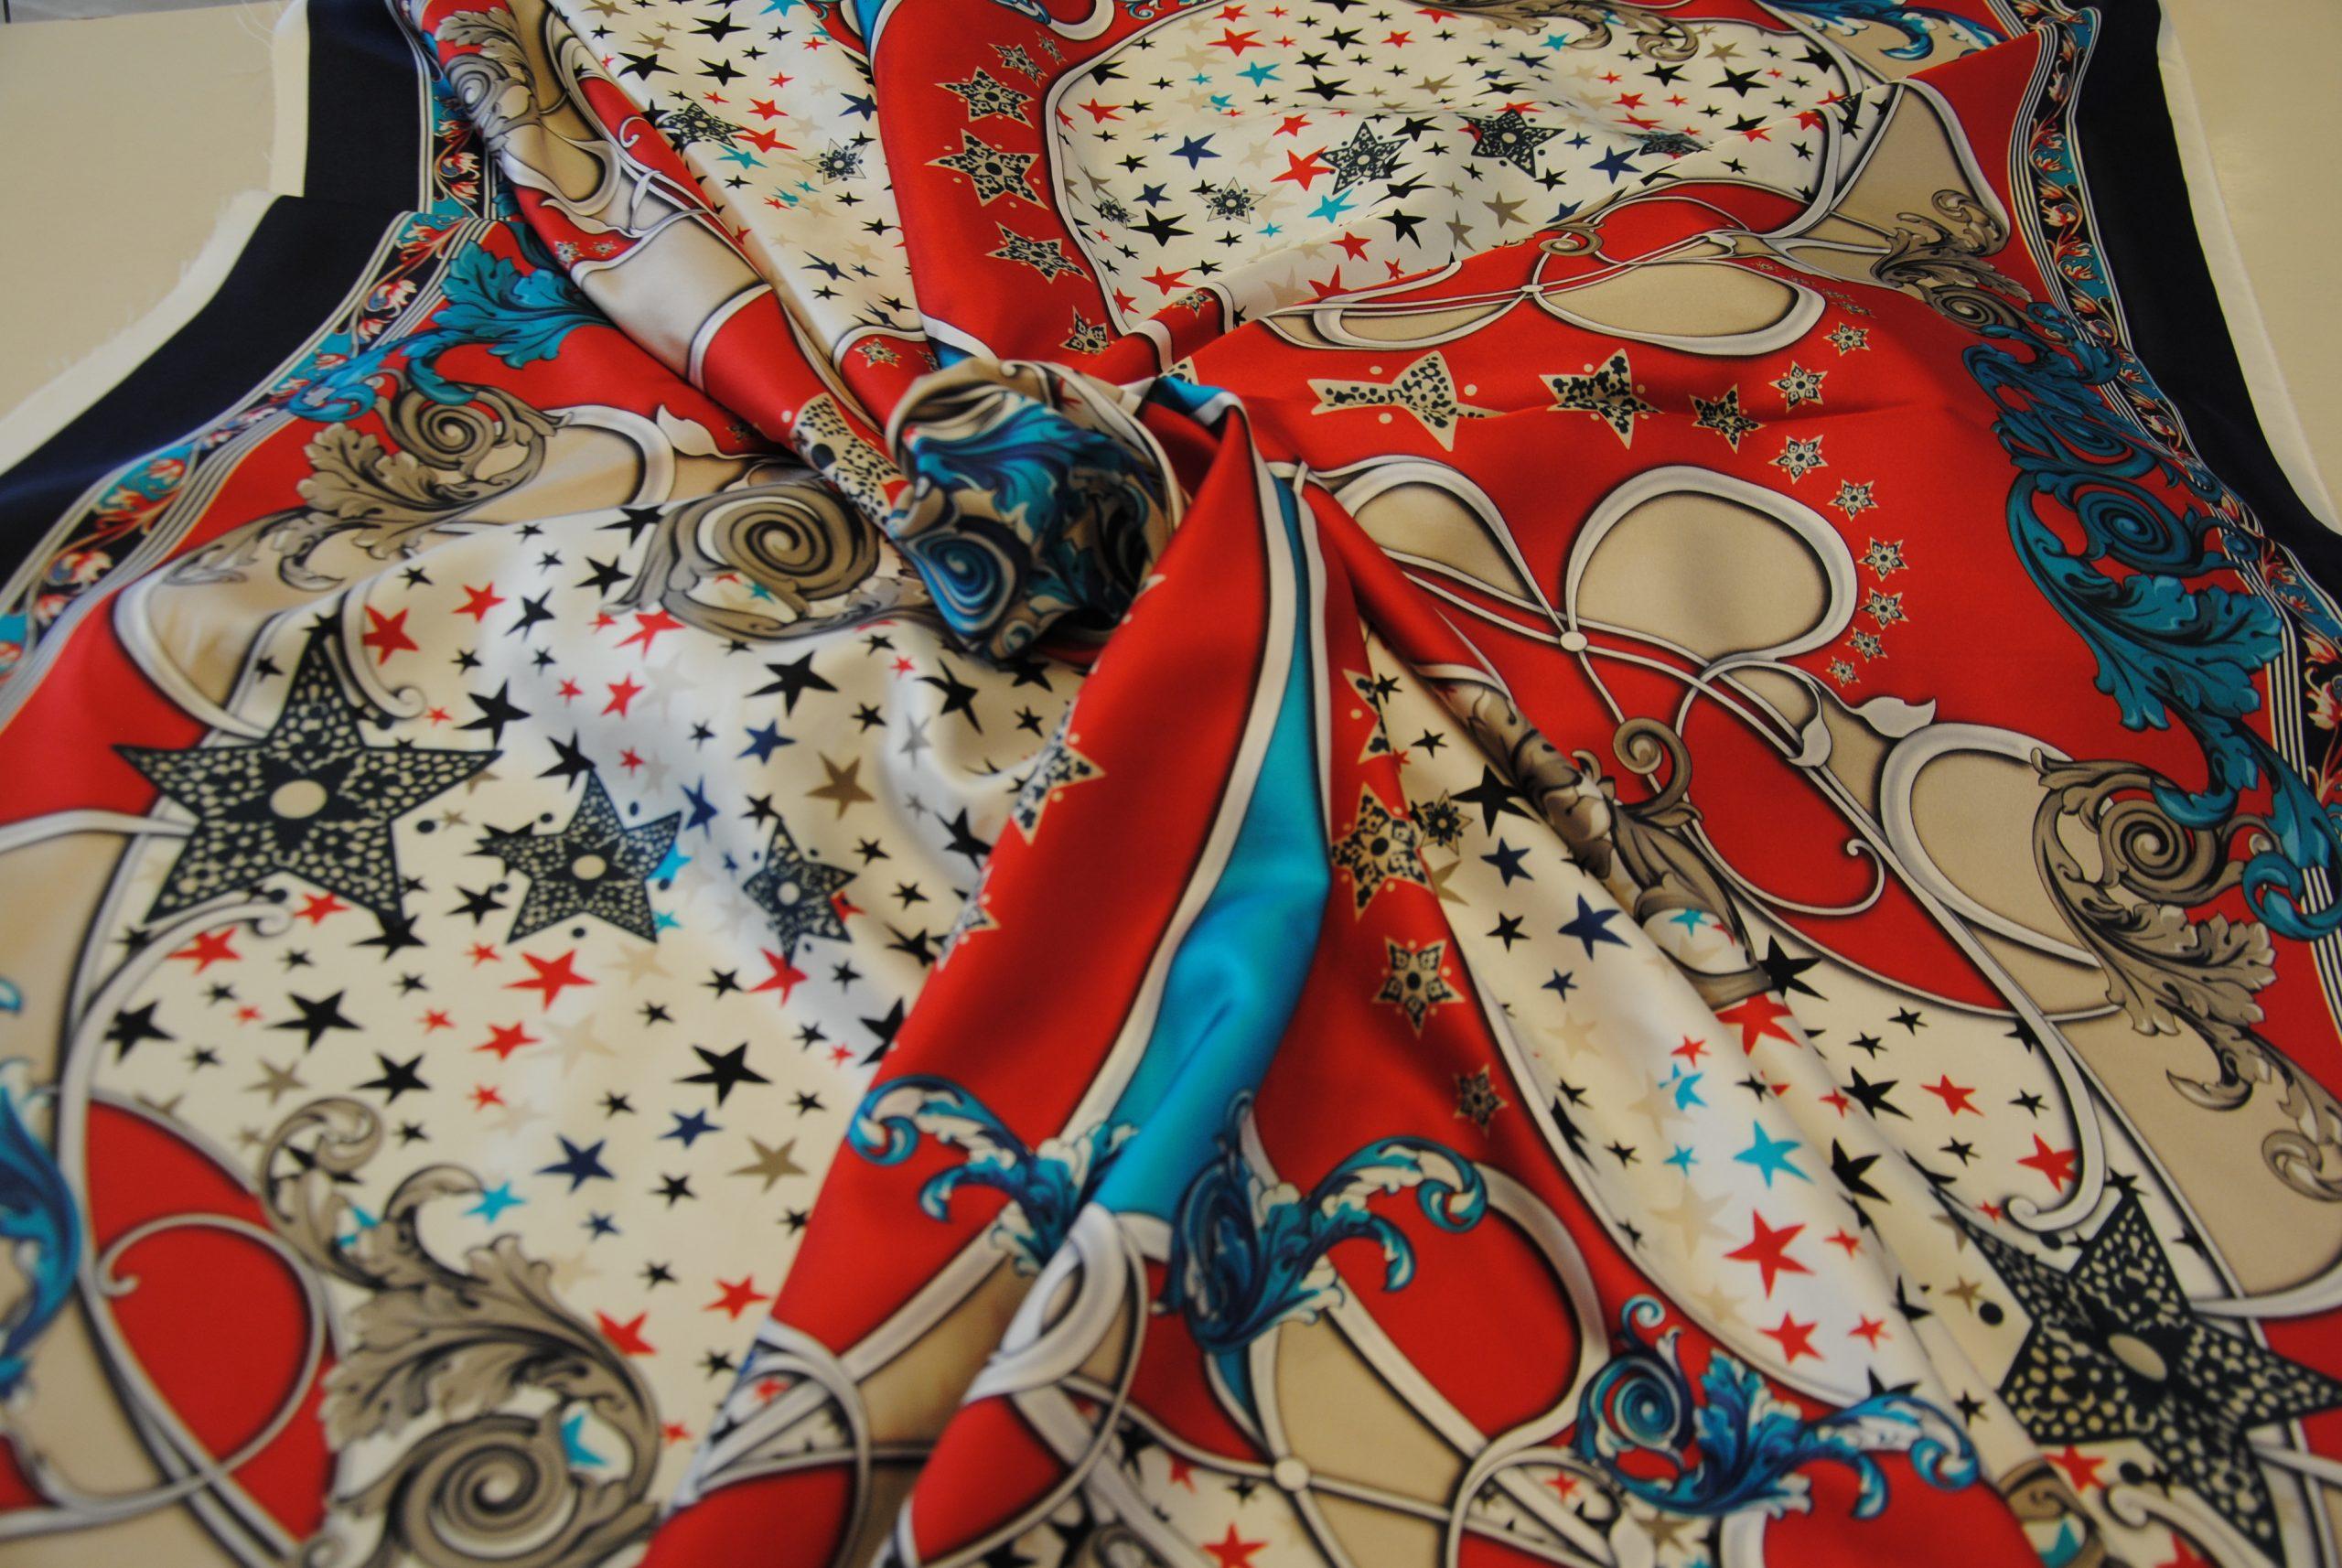 foulard seta 3 scaled Foulard Seta   STAR SYSTEM